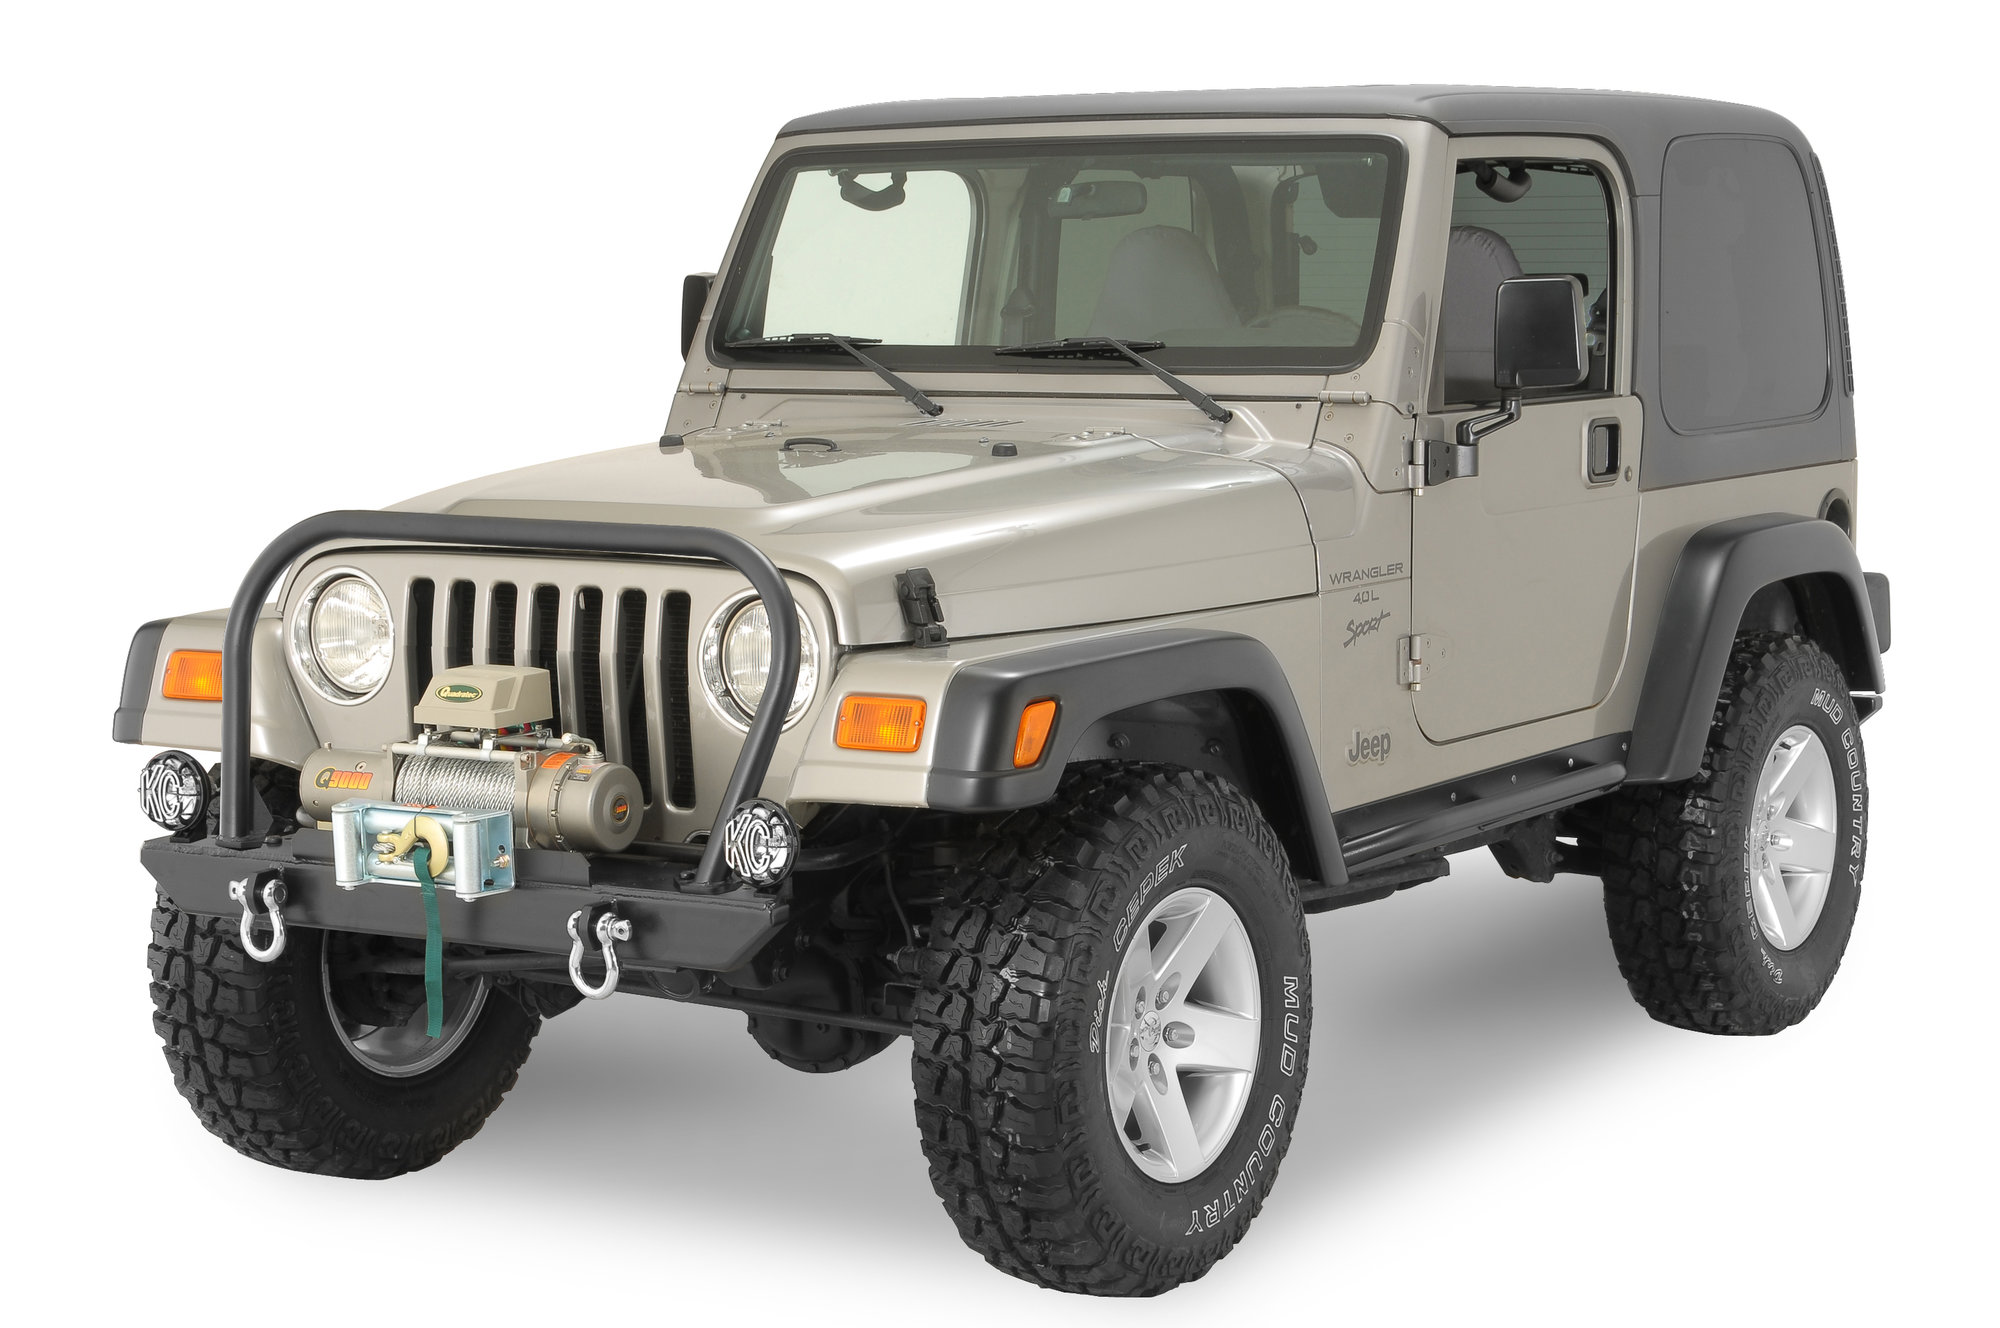 hight resolution of rock hard 4x4 rh4001 rock hard front bumper for 76 06 jeep cj wrangler yj tj unlimited quadratec